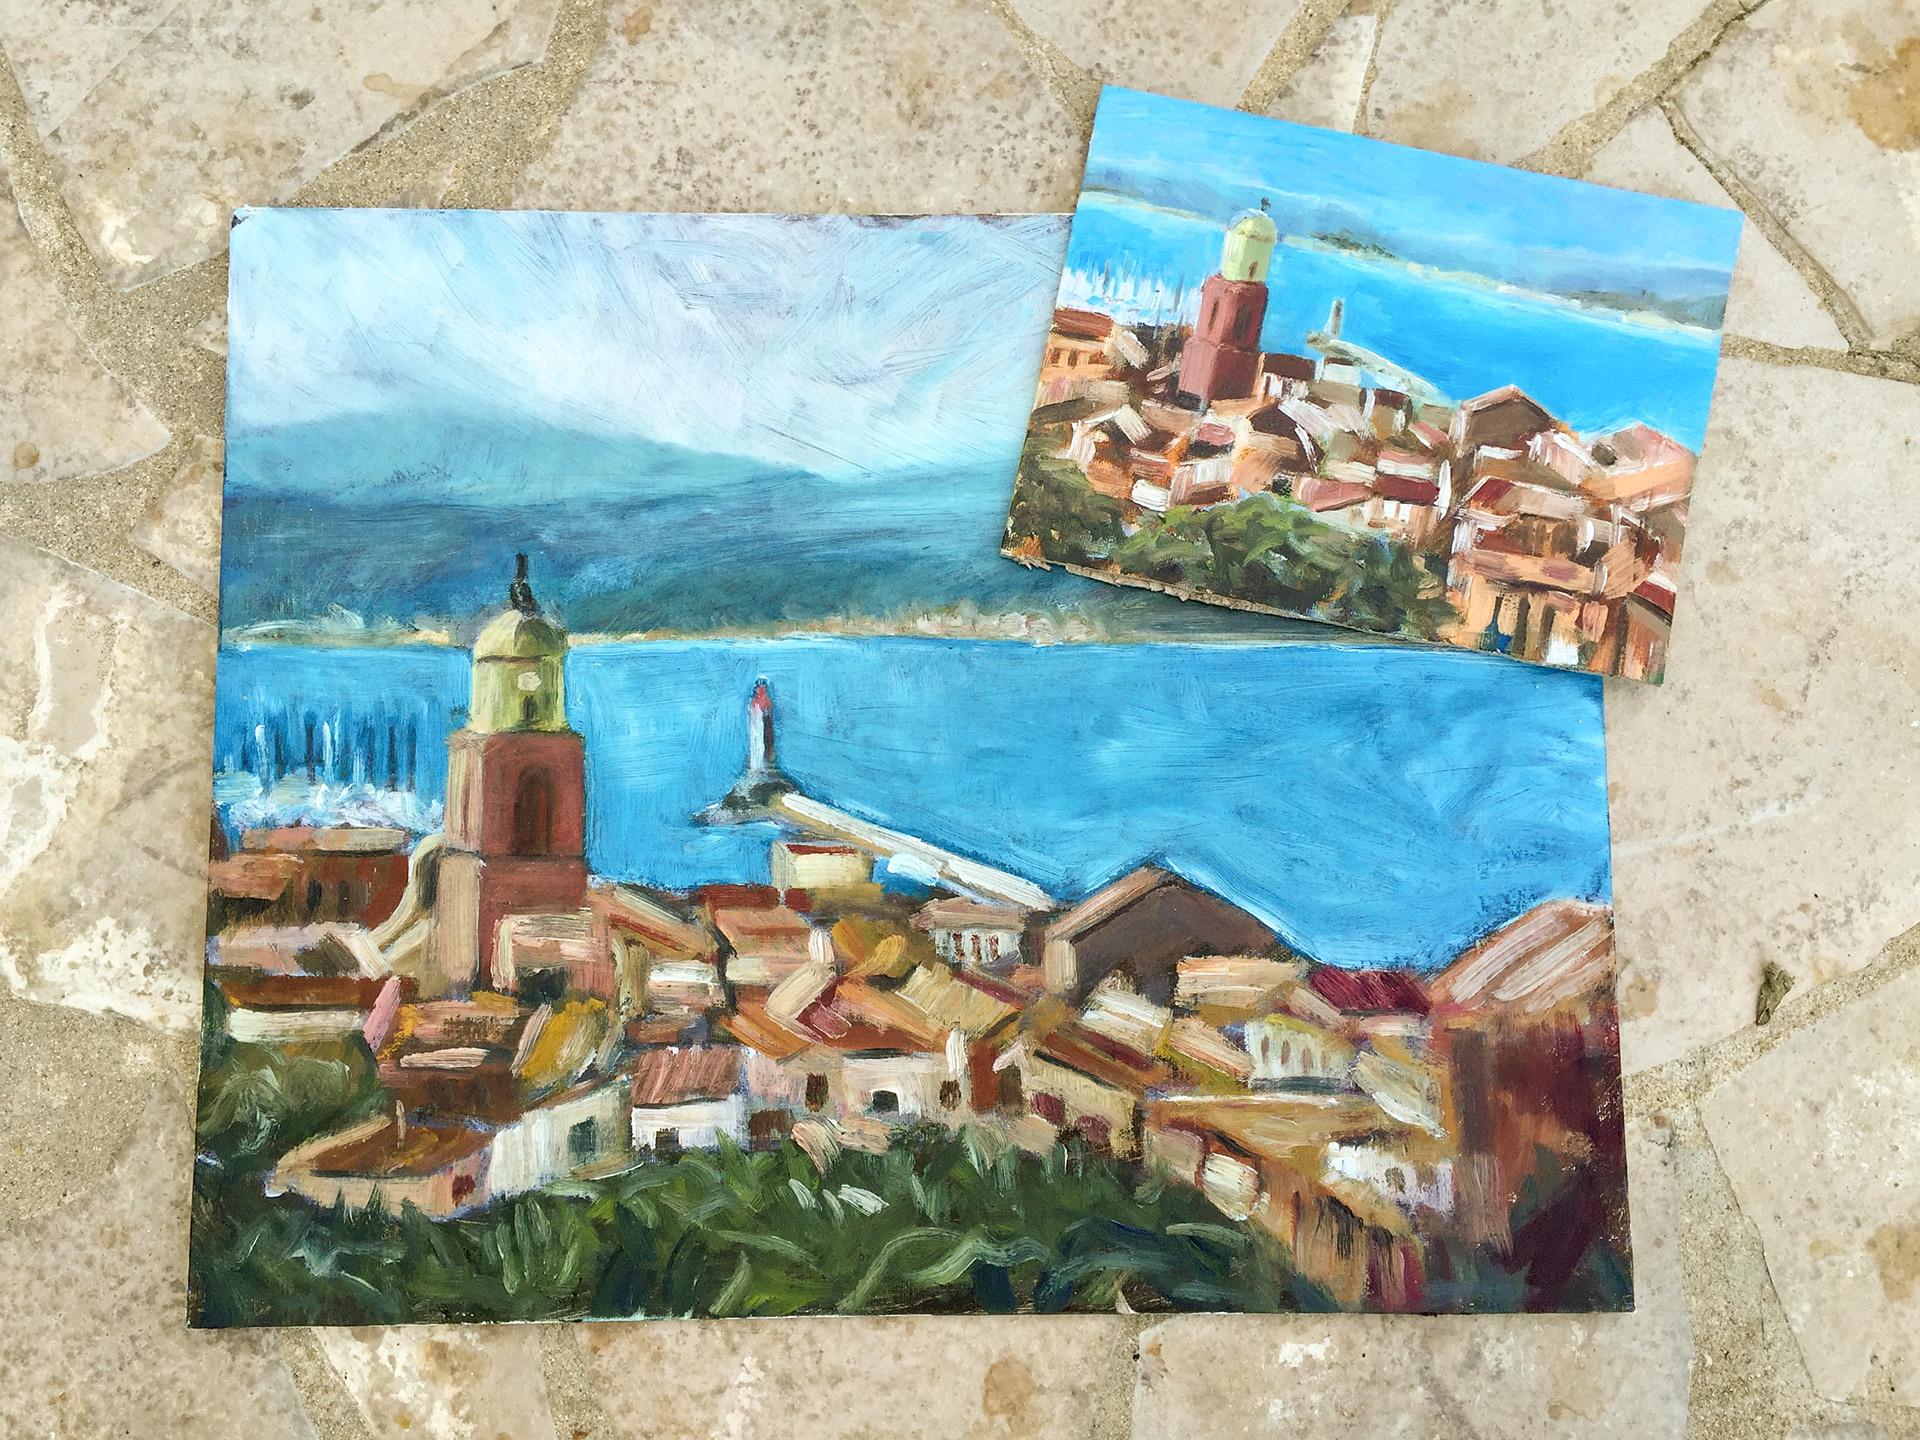 St. Tropez Pein-Air 2 Formate